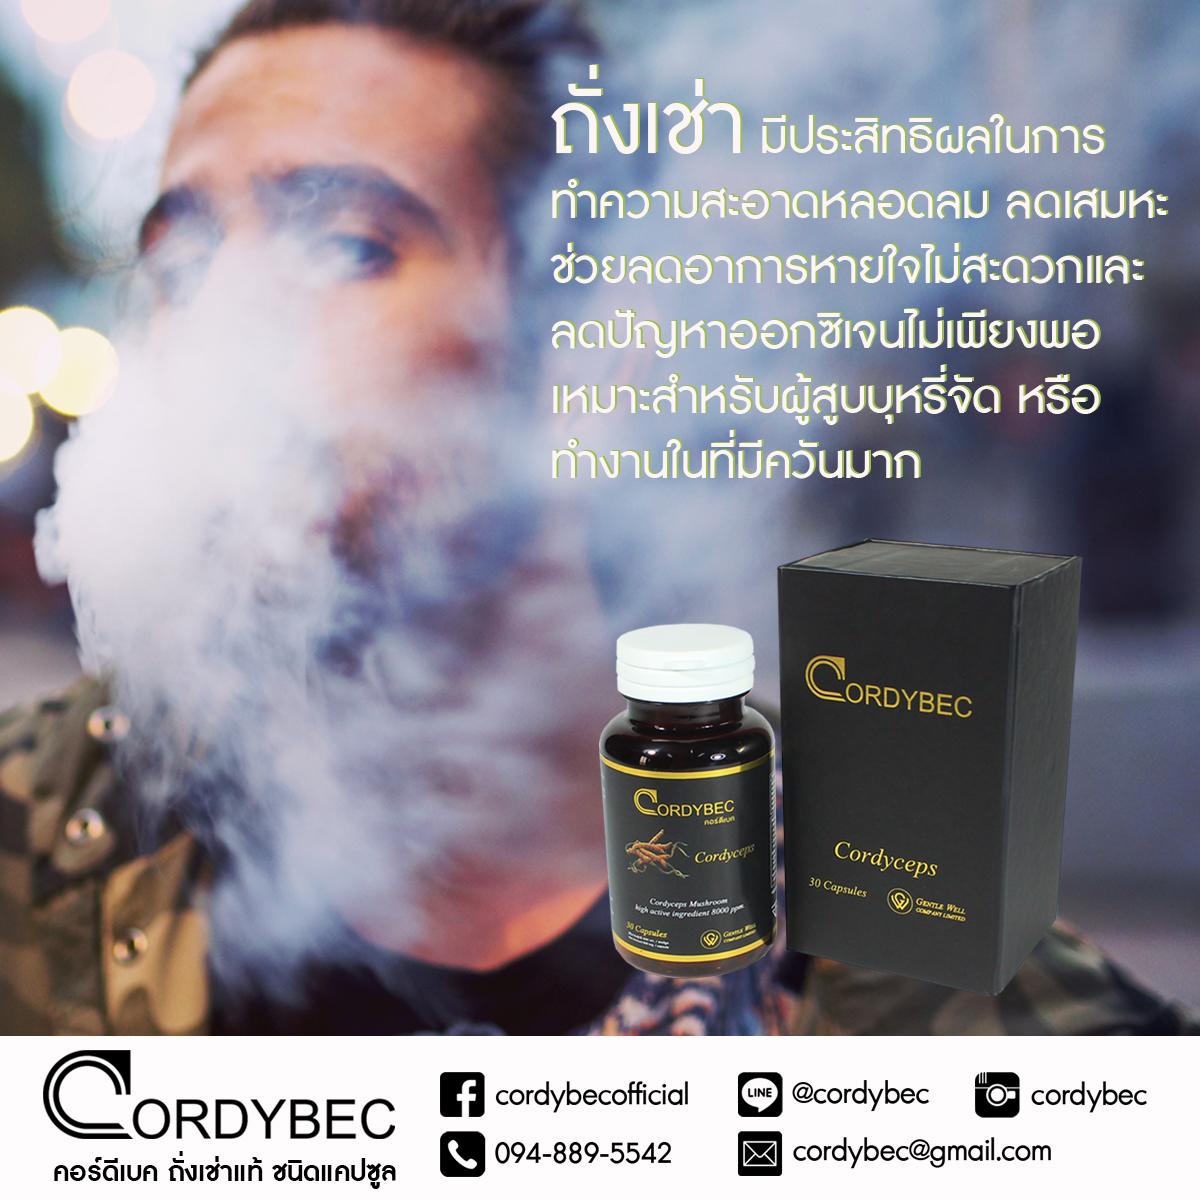 Cordybec lung 008